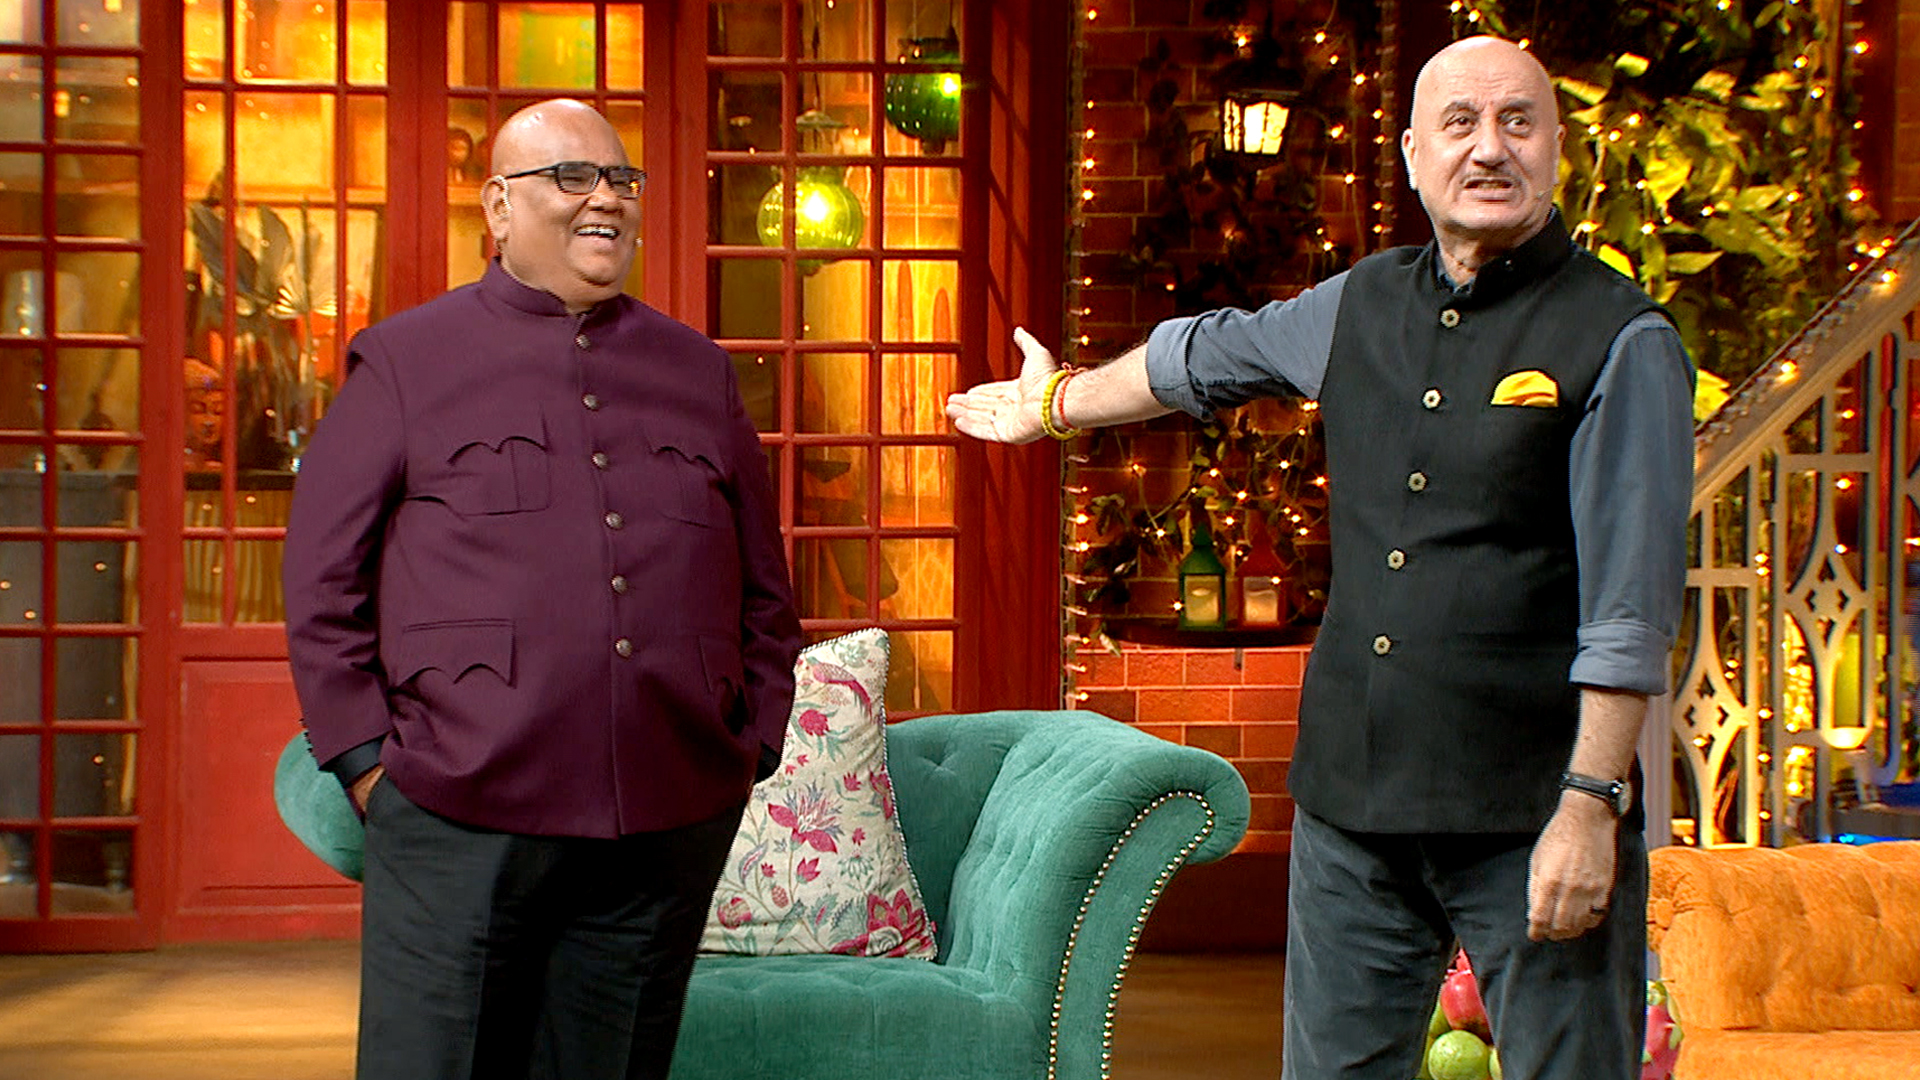 Watch The Kapil Sharma Show Season 2 Episode 162 Online - Anupam Kher, Satish Kaushik, Pankaj Tripathi On Kapil's Show - SonyLIV